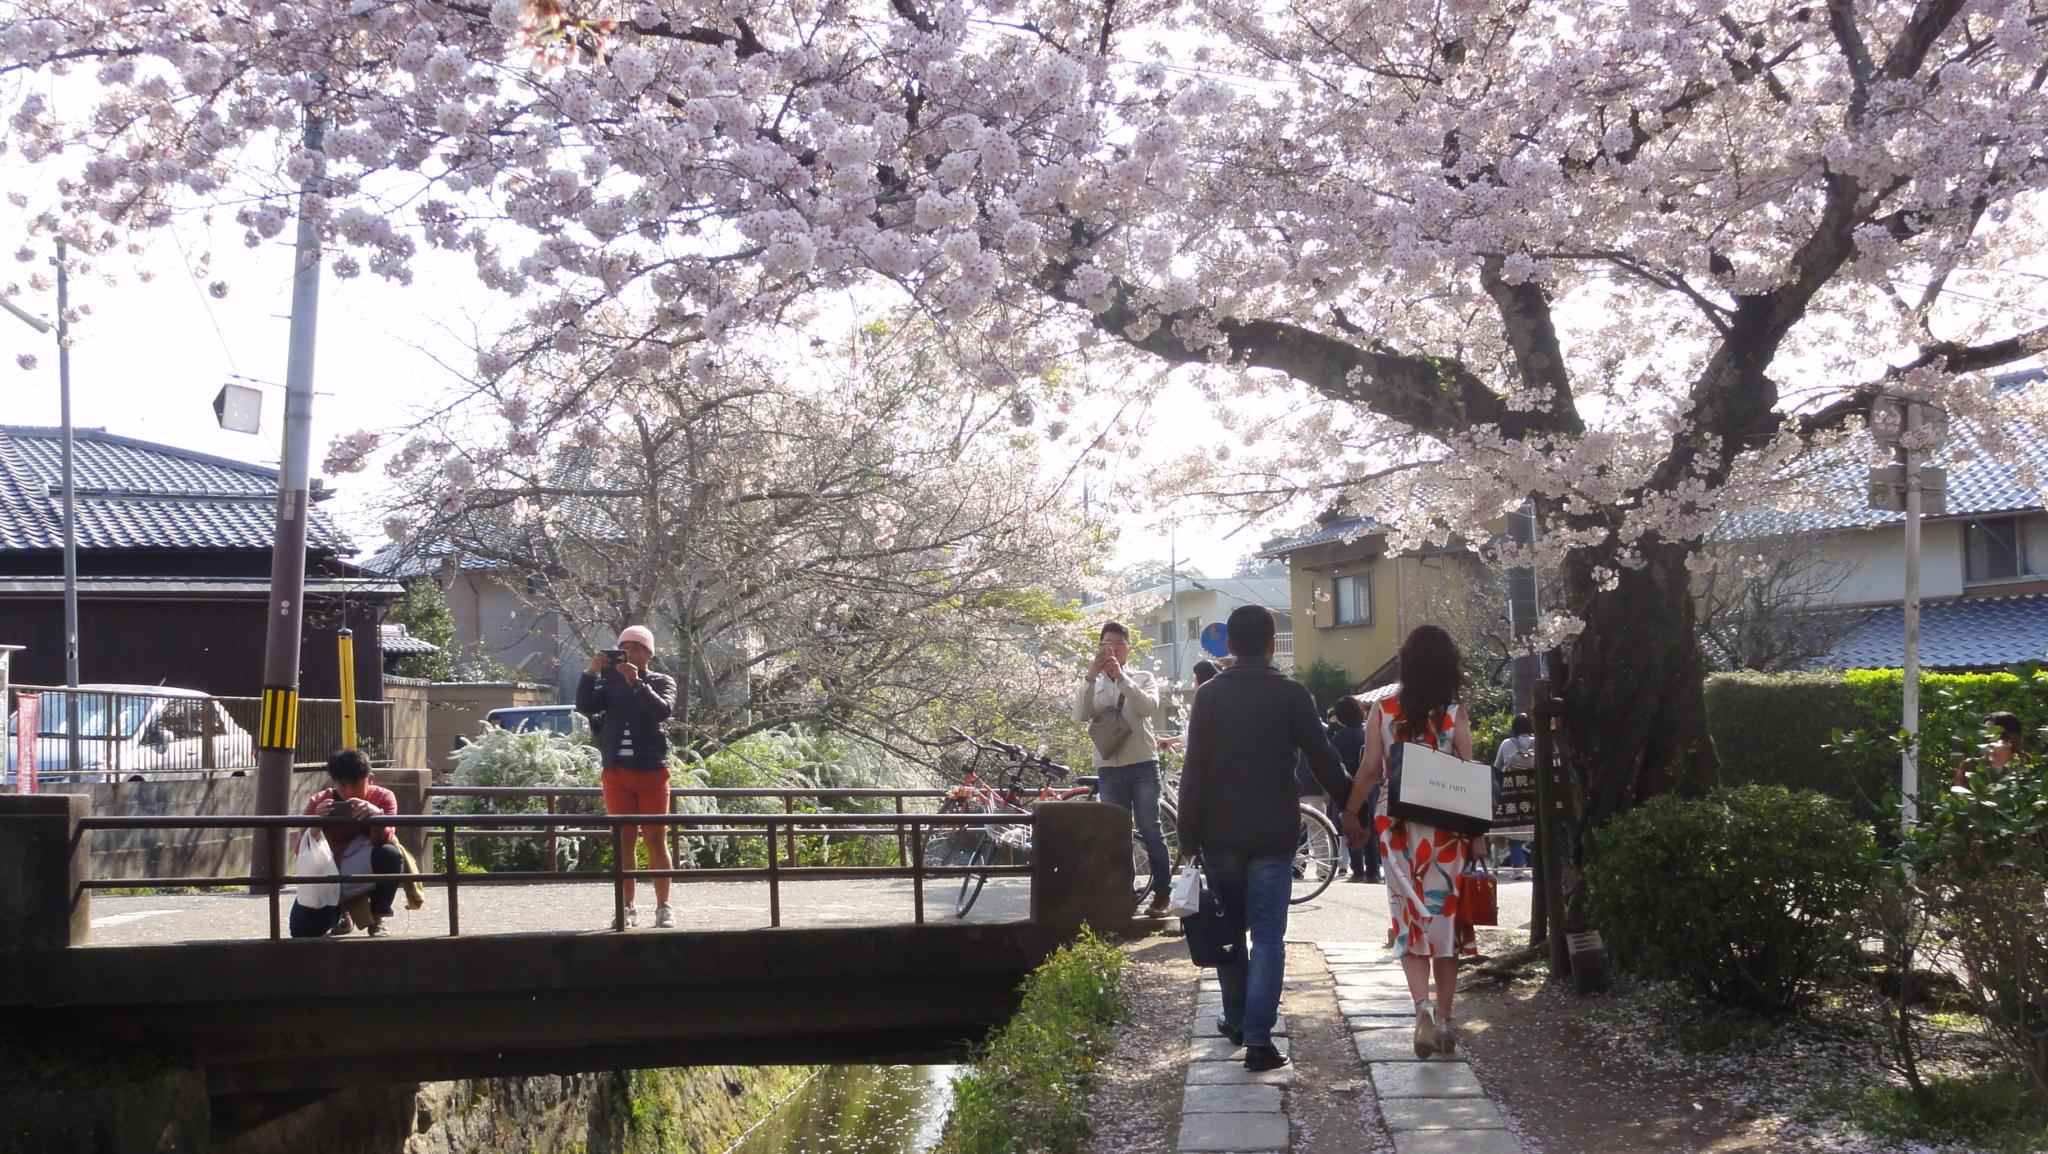 20170414 Kyoto 11